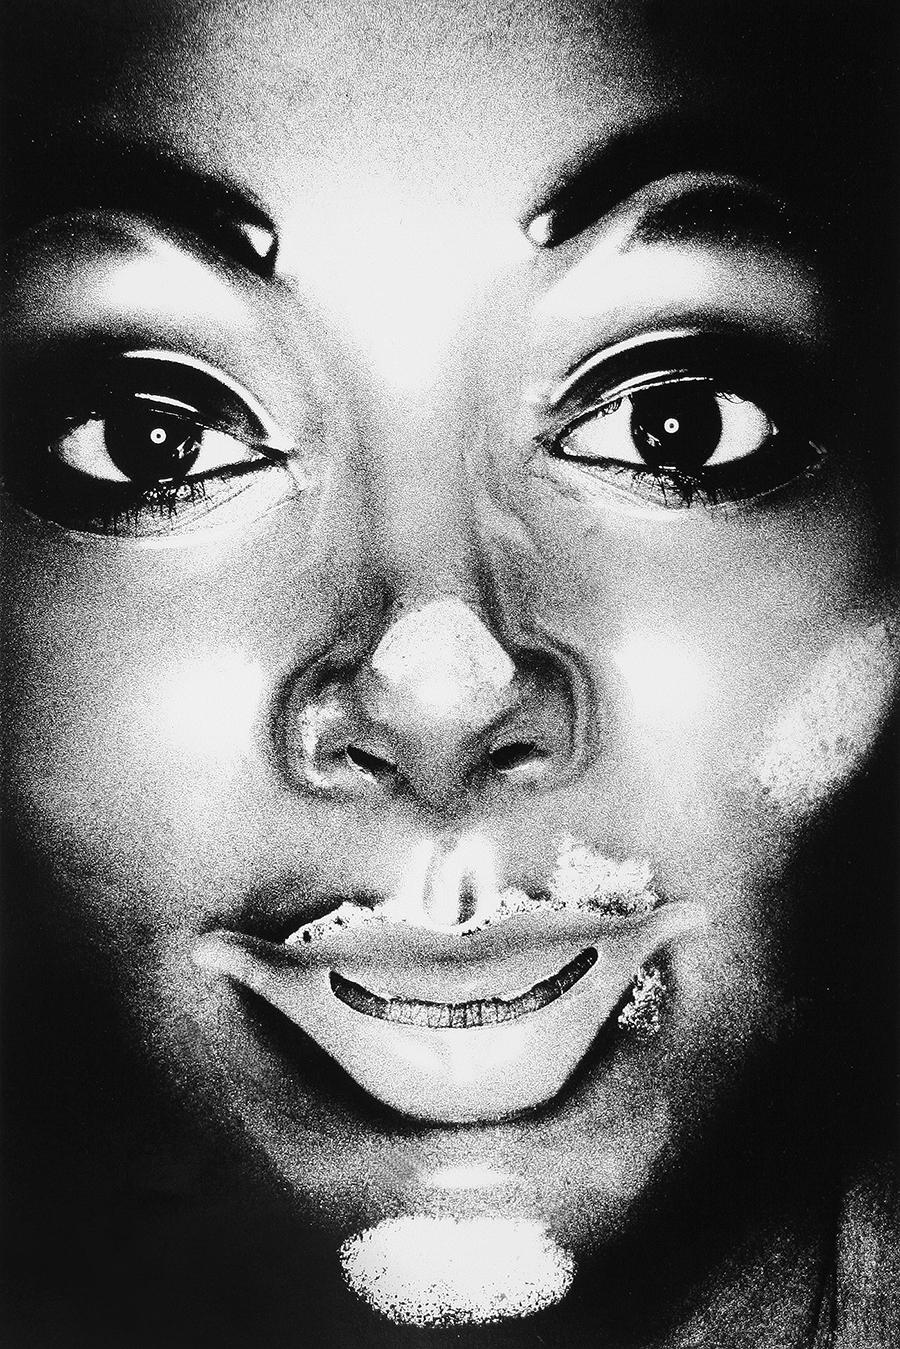 Tony_Ward_early_work_close_ups_1990's_ringflash_mask